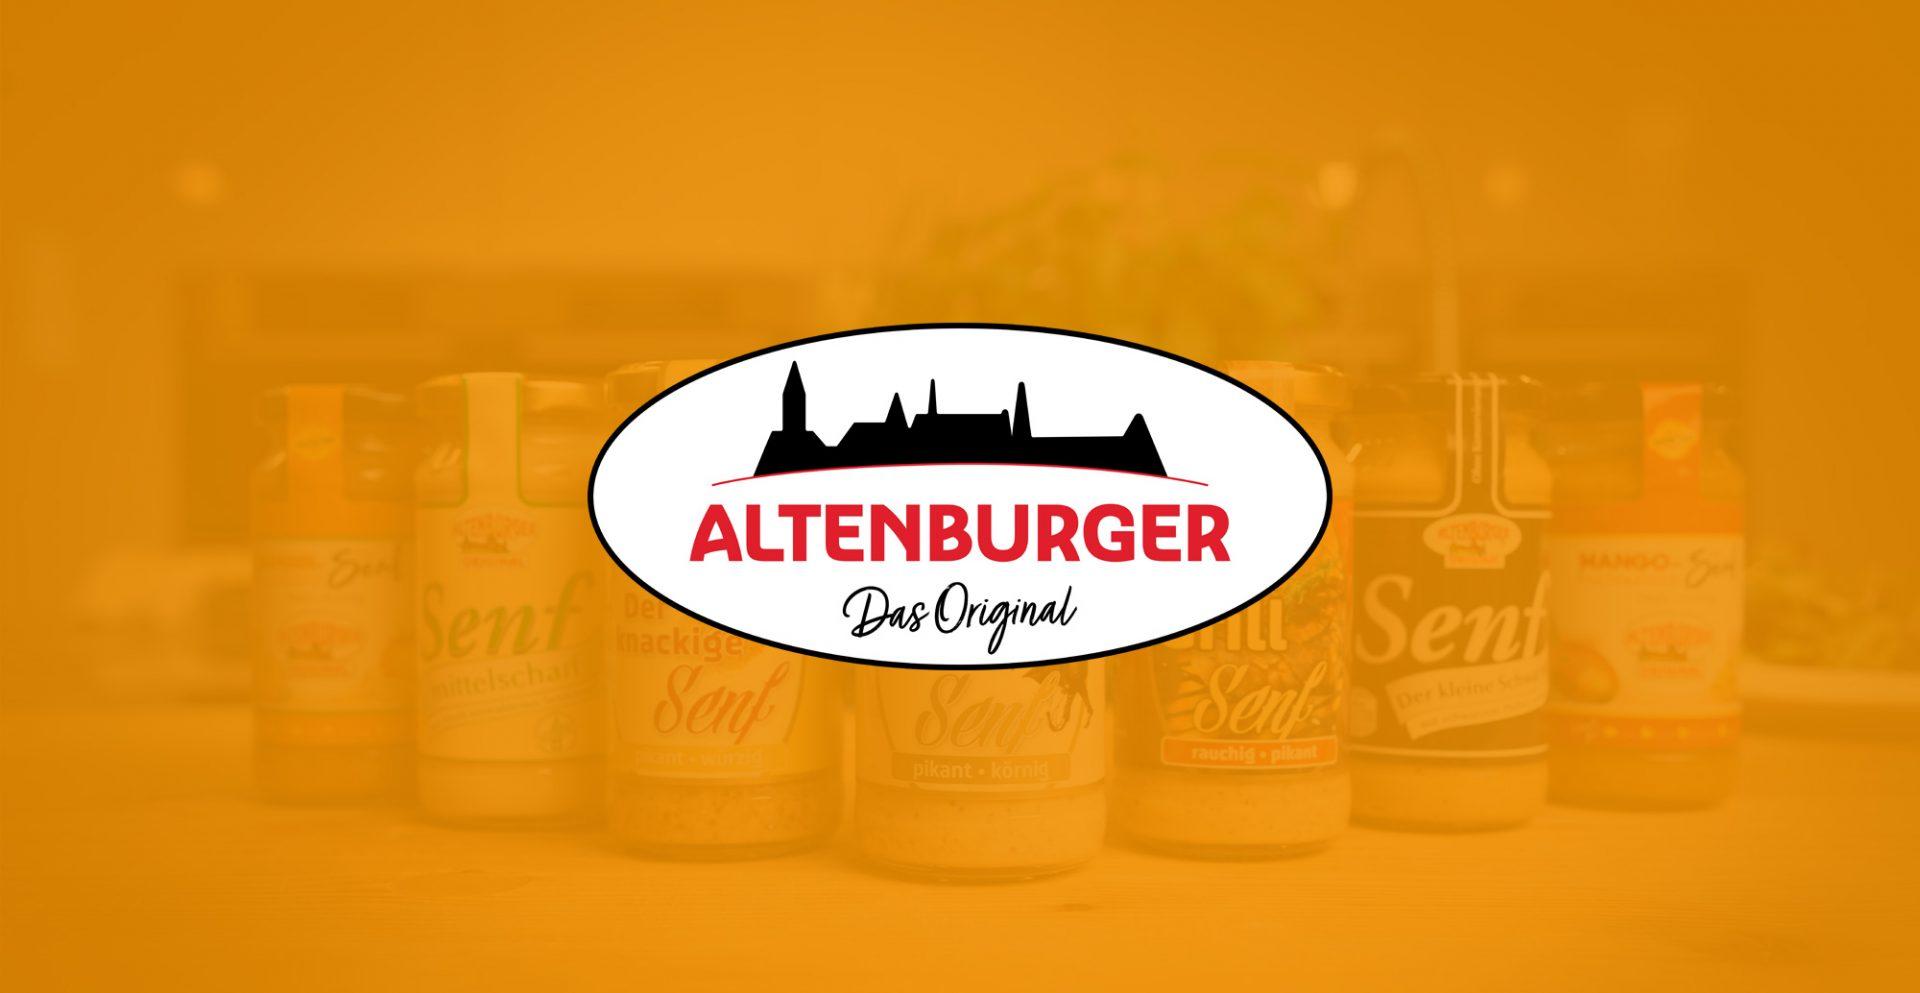 Altenburger Senf & Feinkost GmbH & Co KG